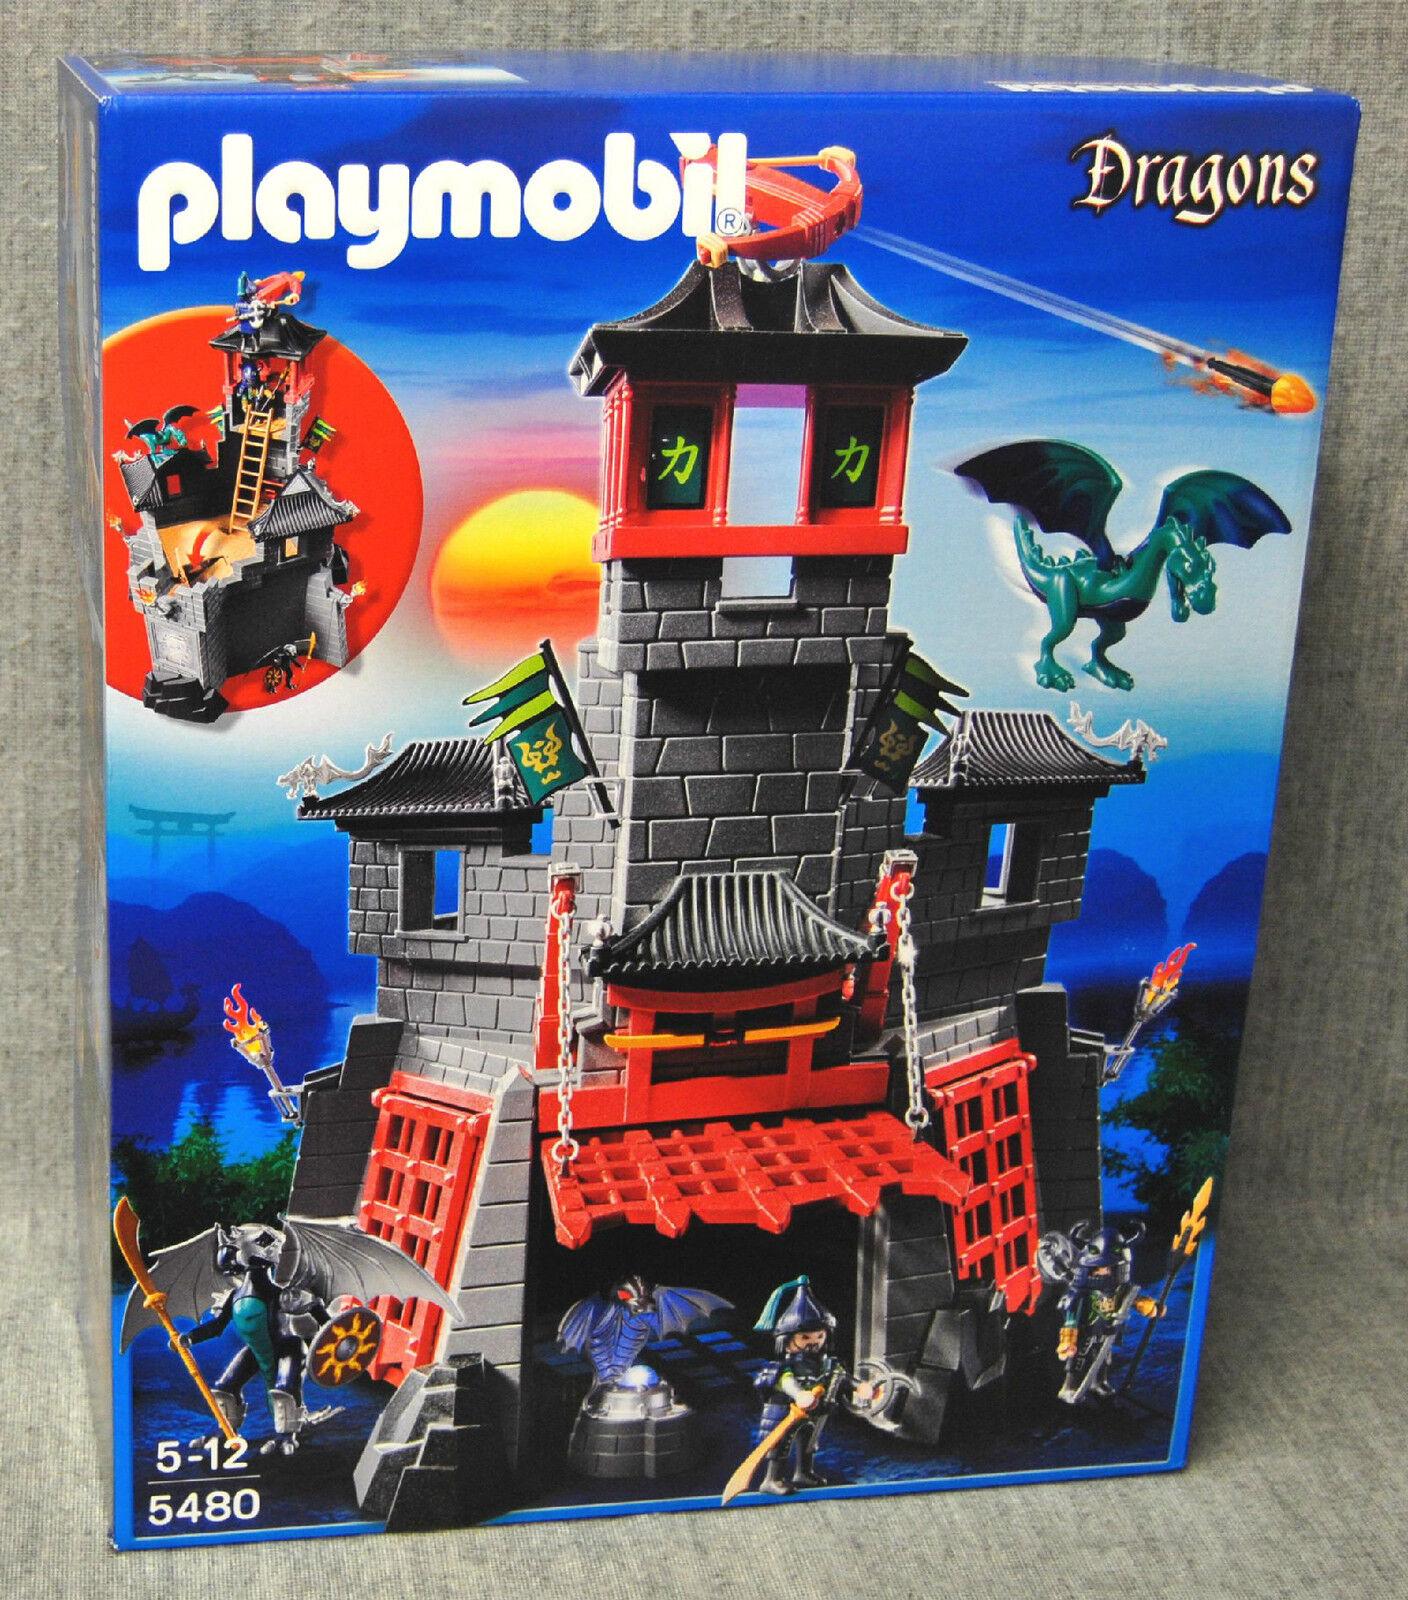 Playmobil 5480 Geheime Drachenfestung – Asia-Drachenland – Dragons Neu